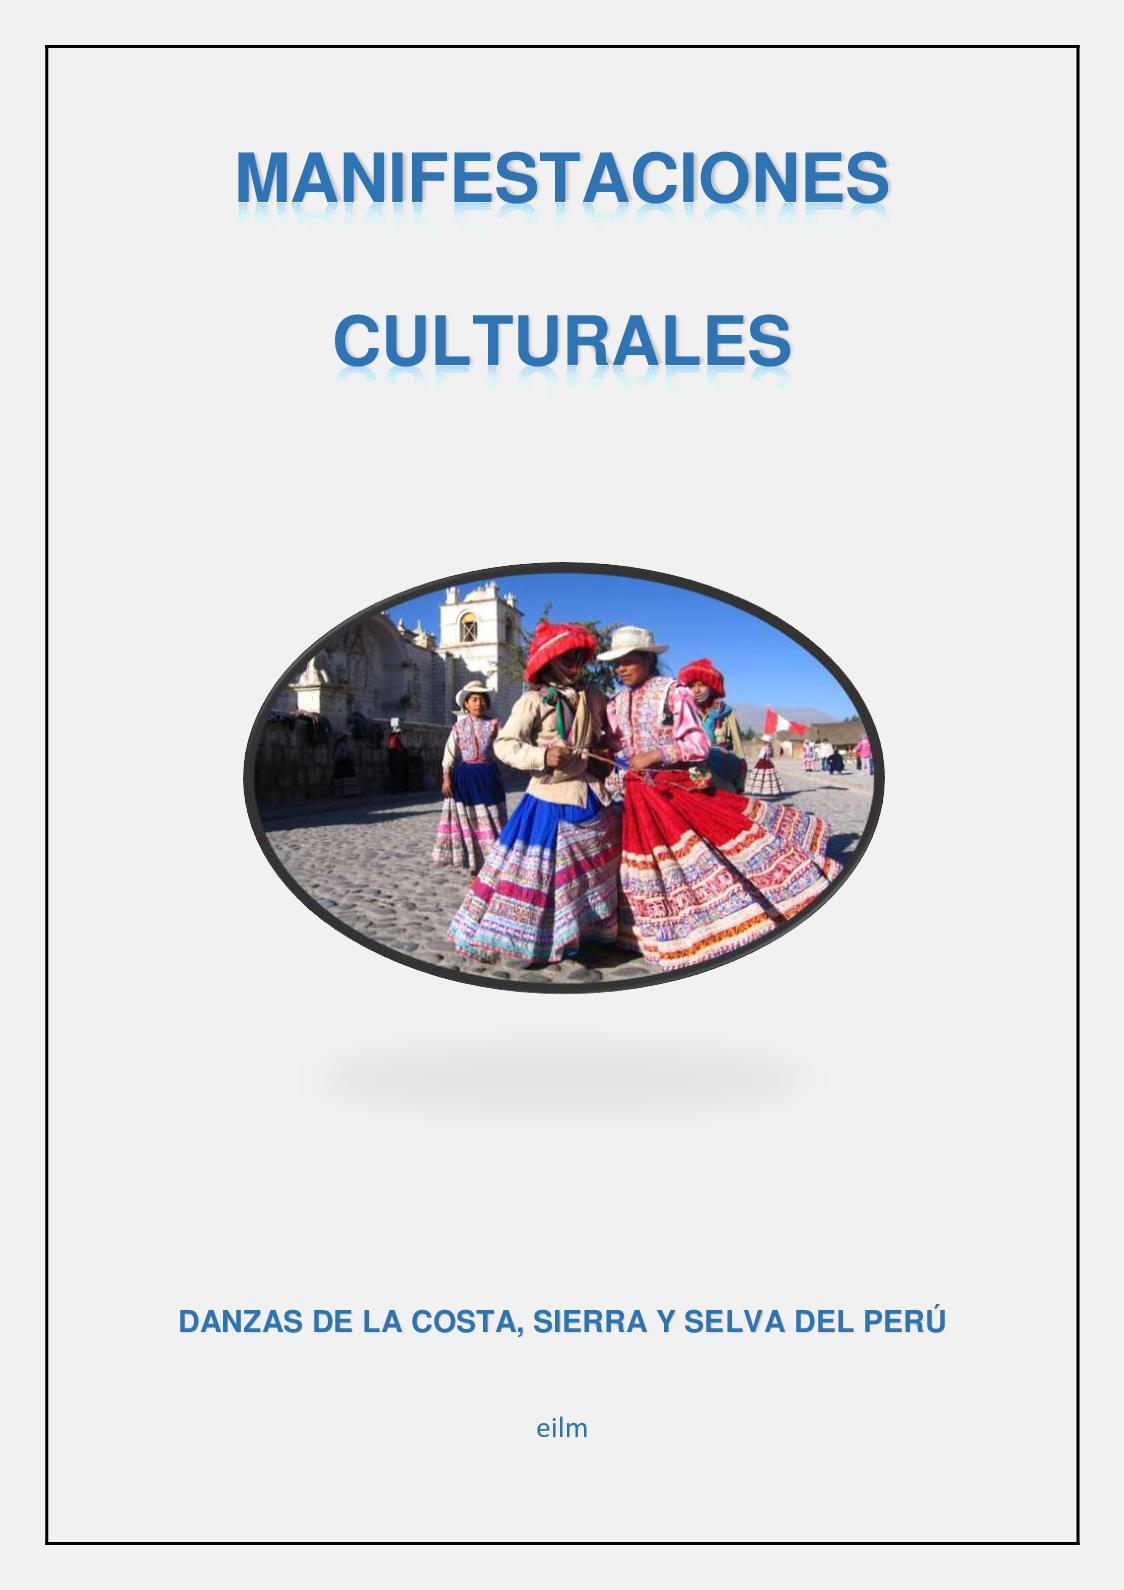 Calaméo Manifestaciones Culturales Danzas Del Perú